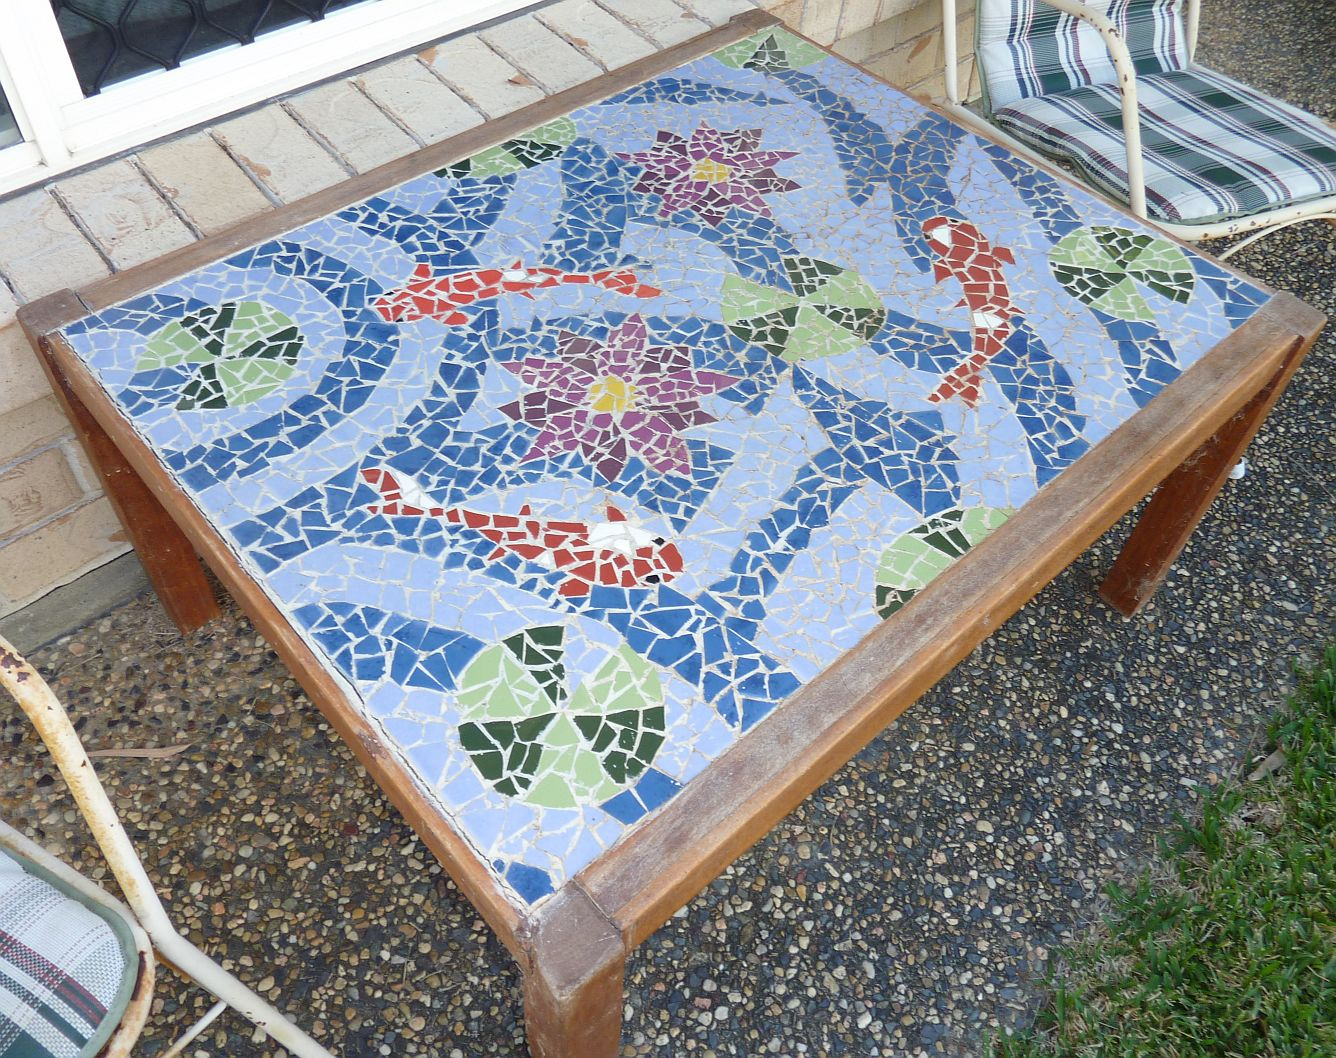 Impressive Mosaic Tile Table Top Pattern 1336 x 1058 · 390 kB · jpeg